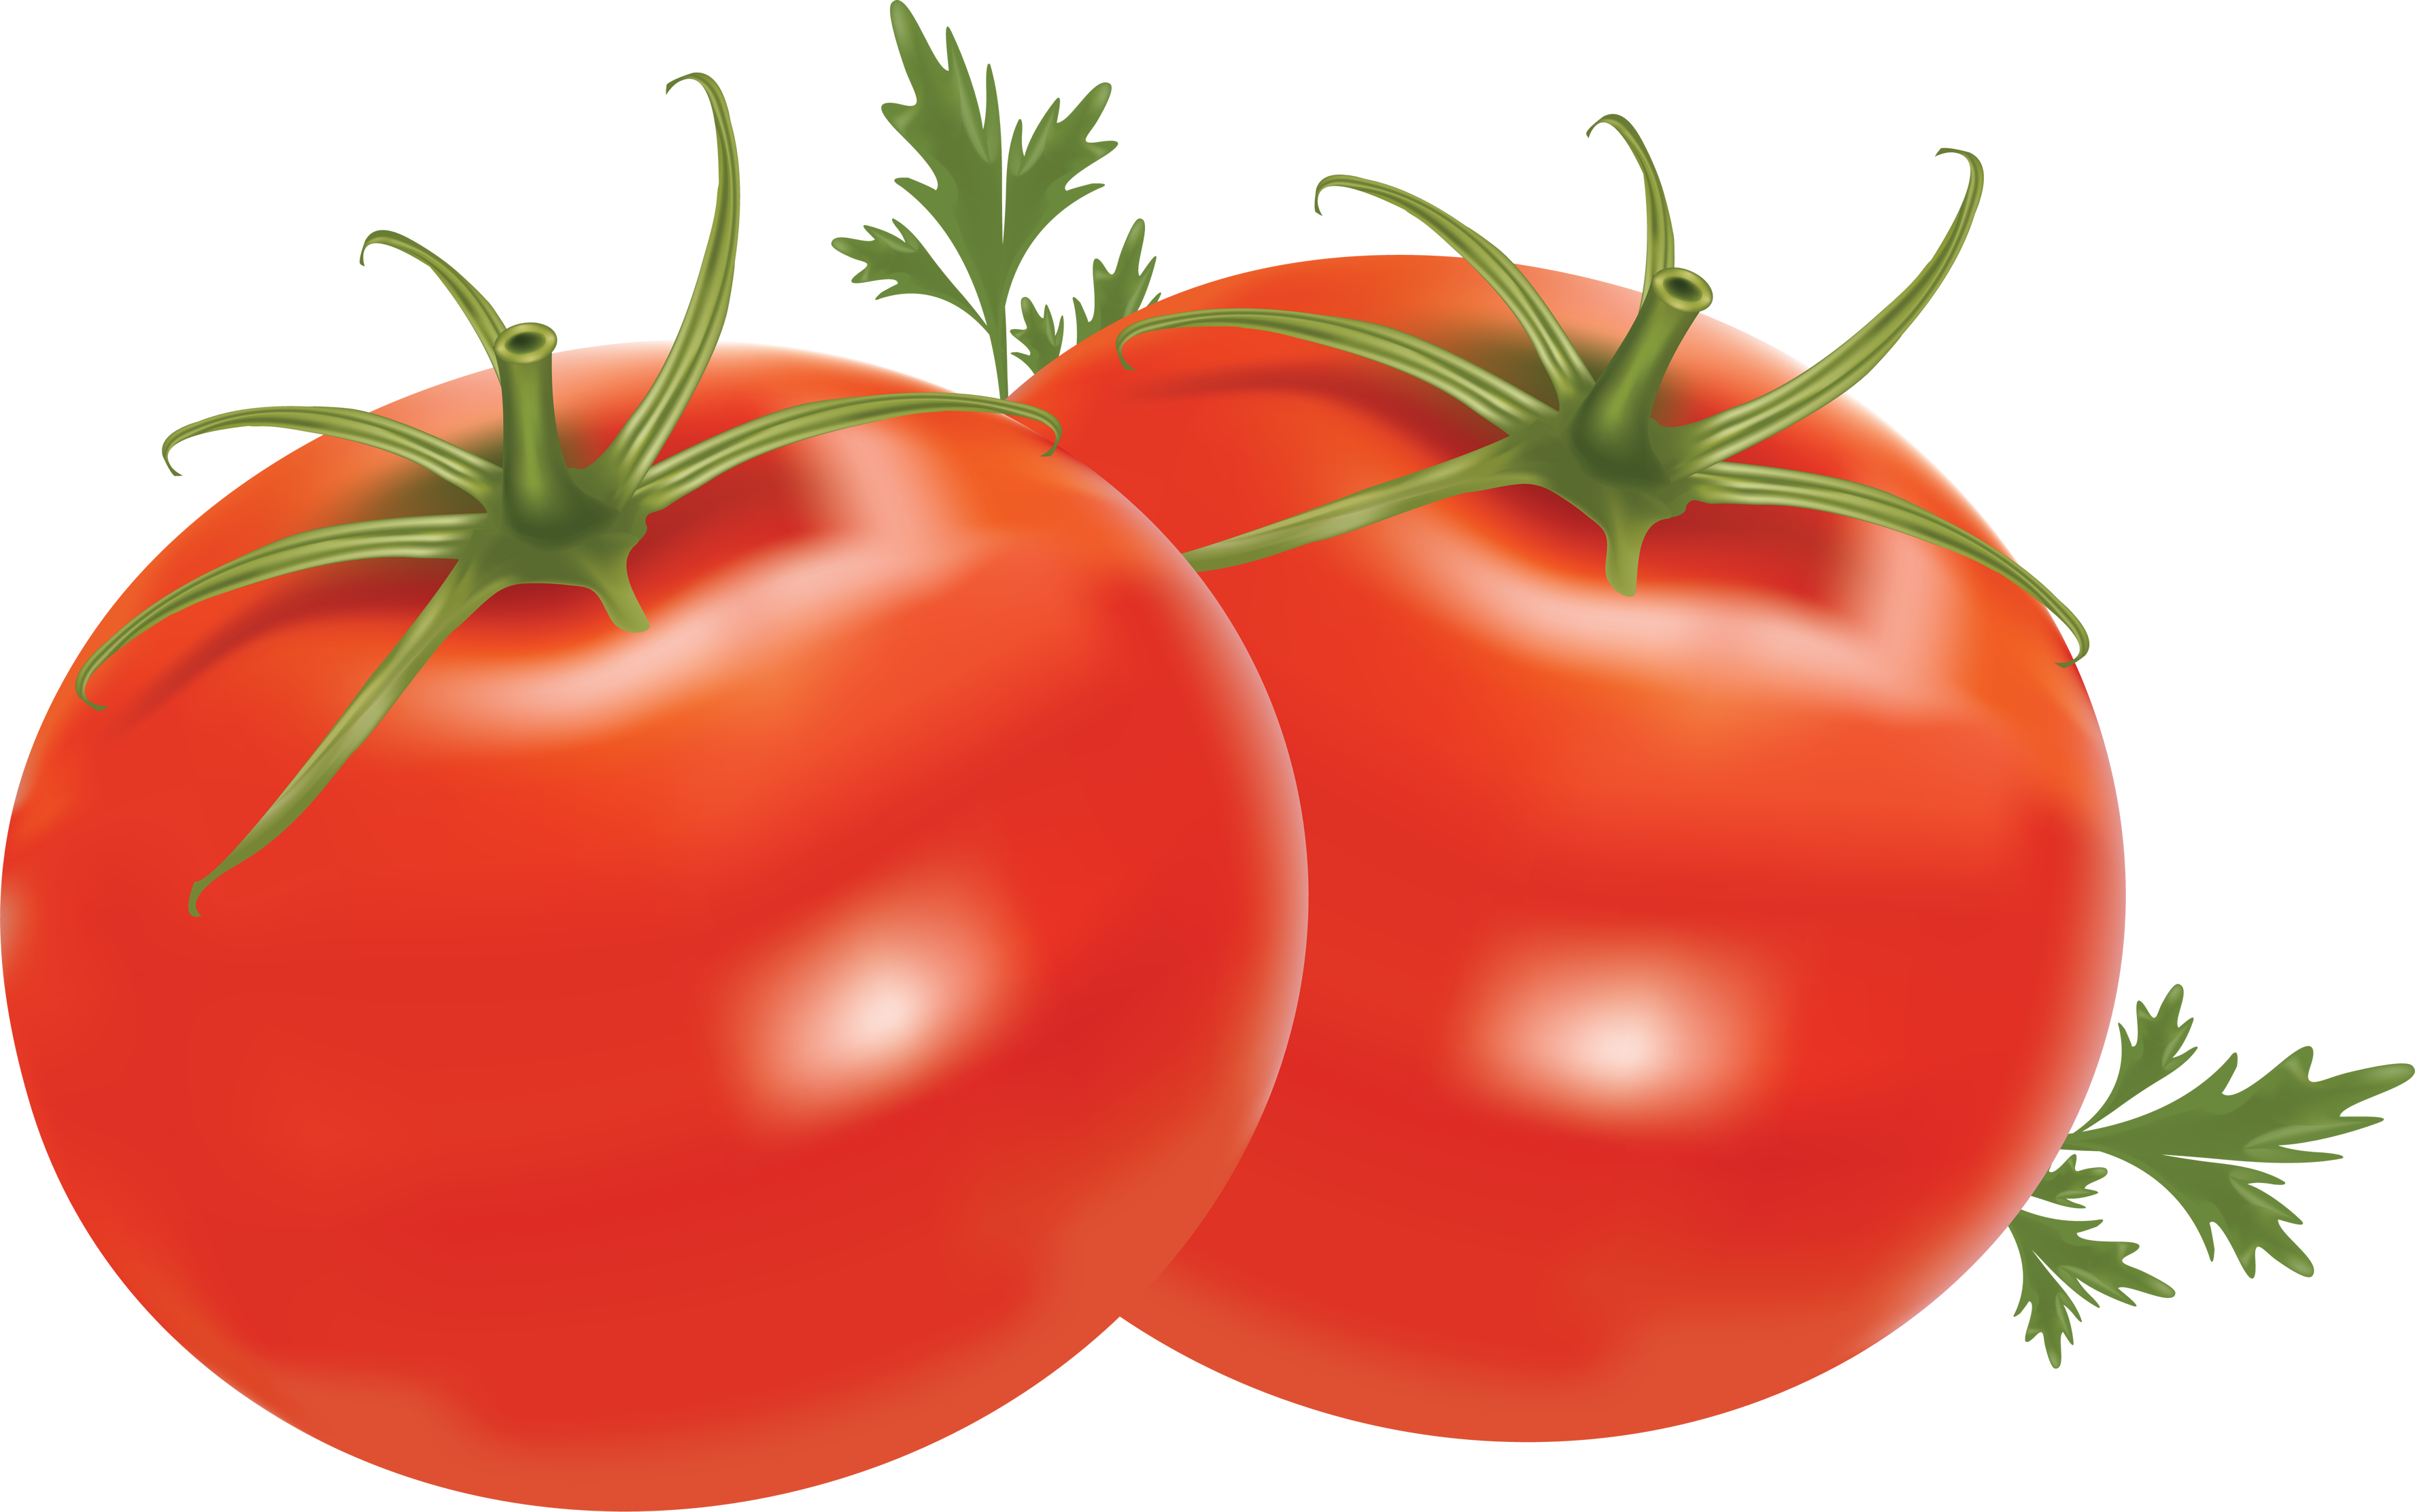 tomato clipart no backround #16